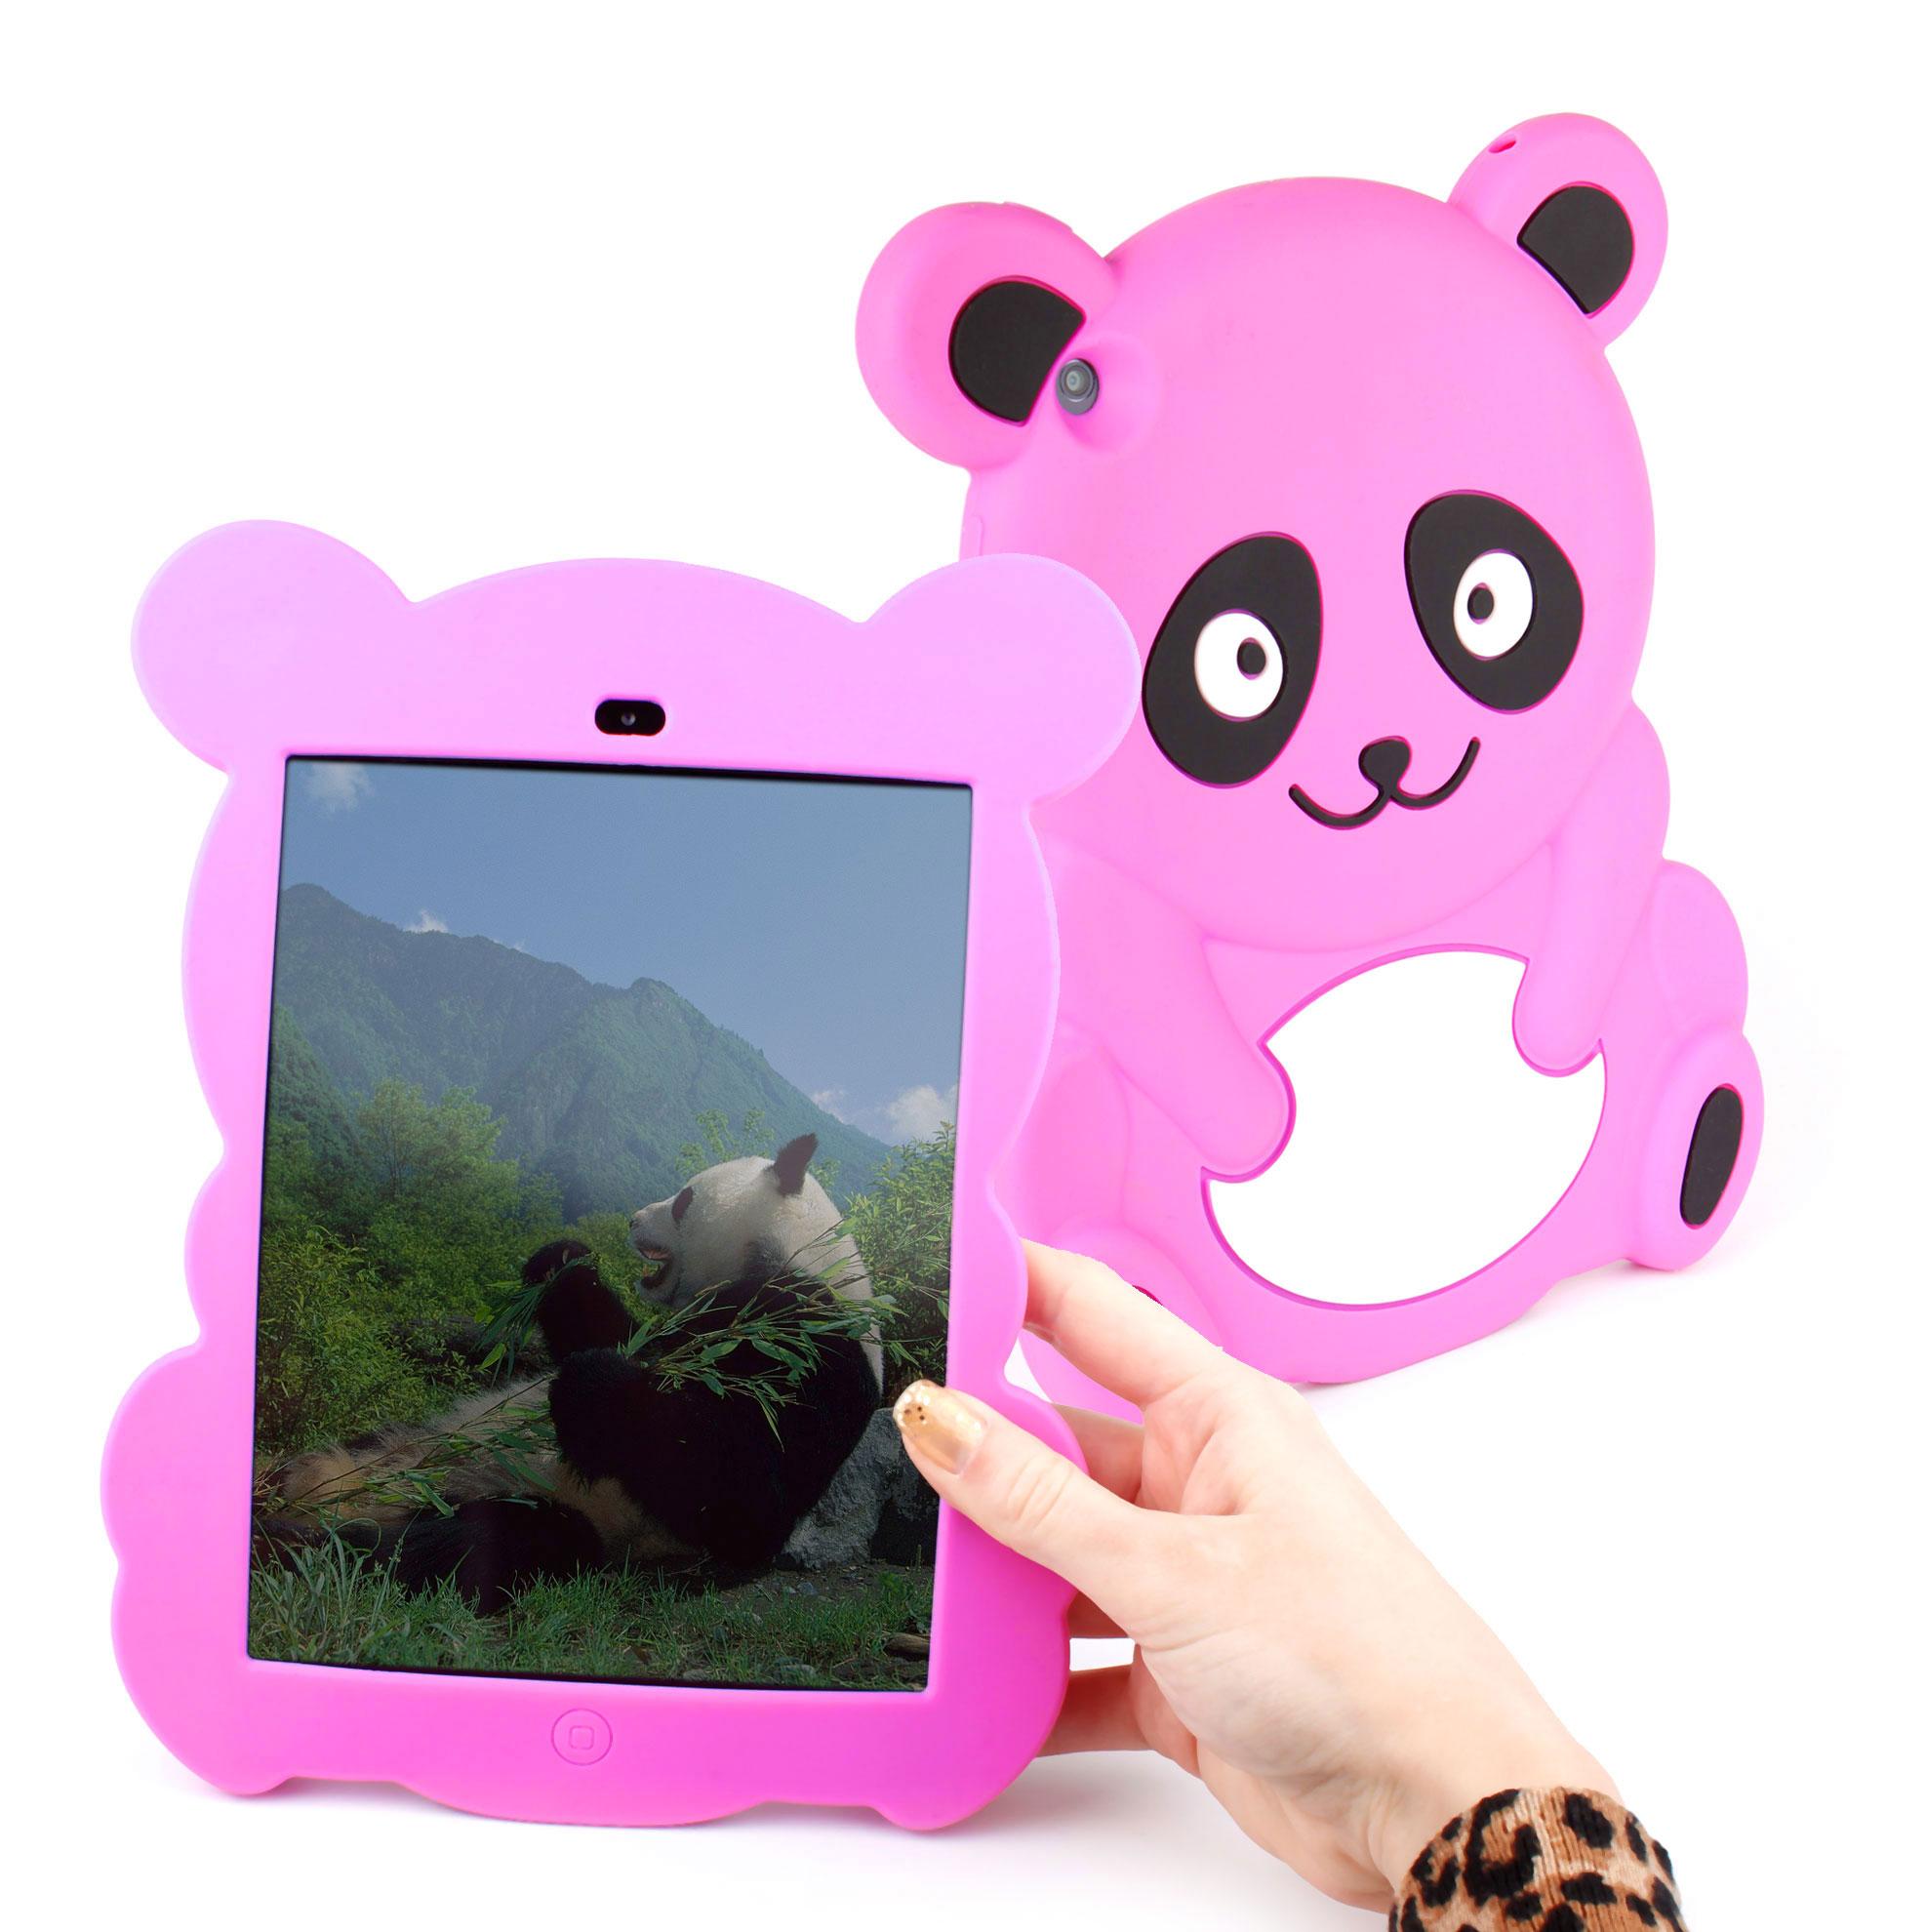 etui coque arri re panda rose pour la tablette apple ipad. Black Bedroom Furniture Sets. Home Design Ideas